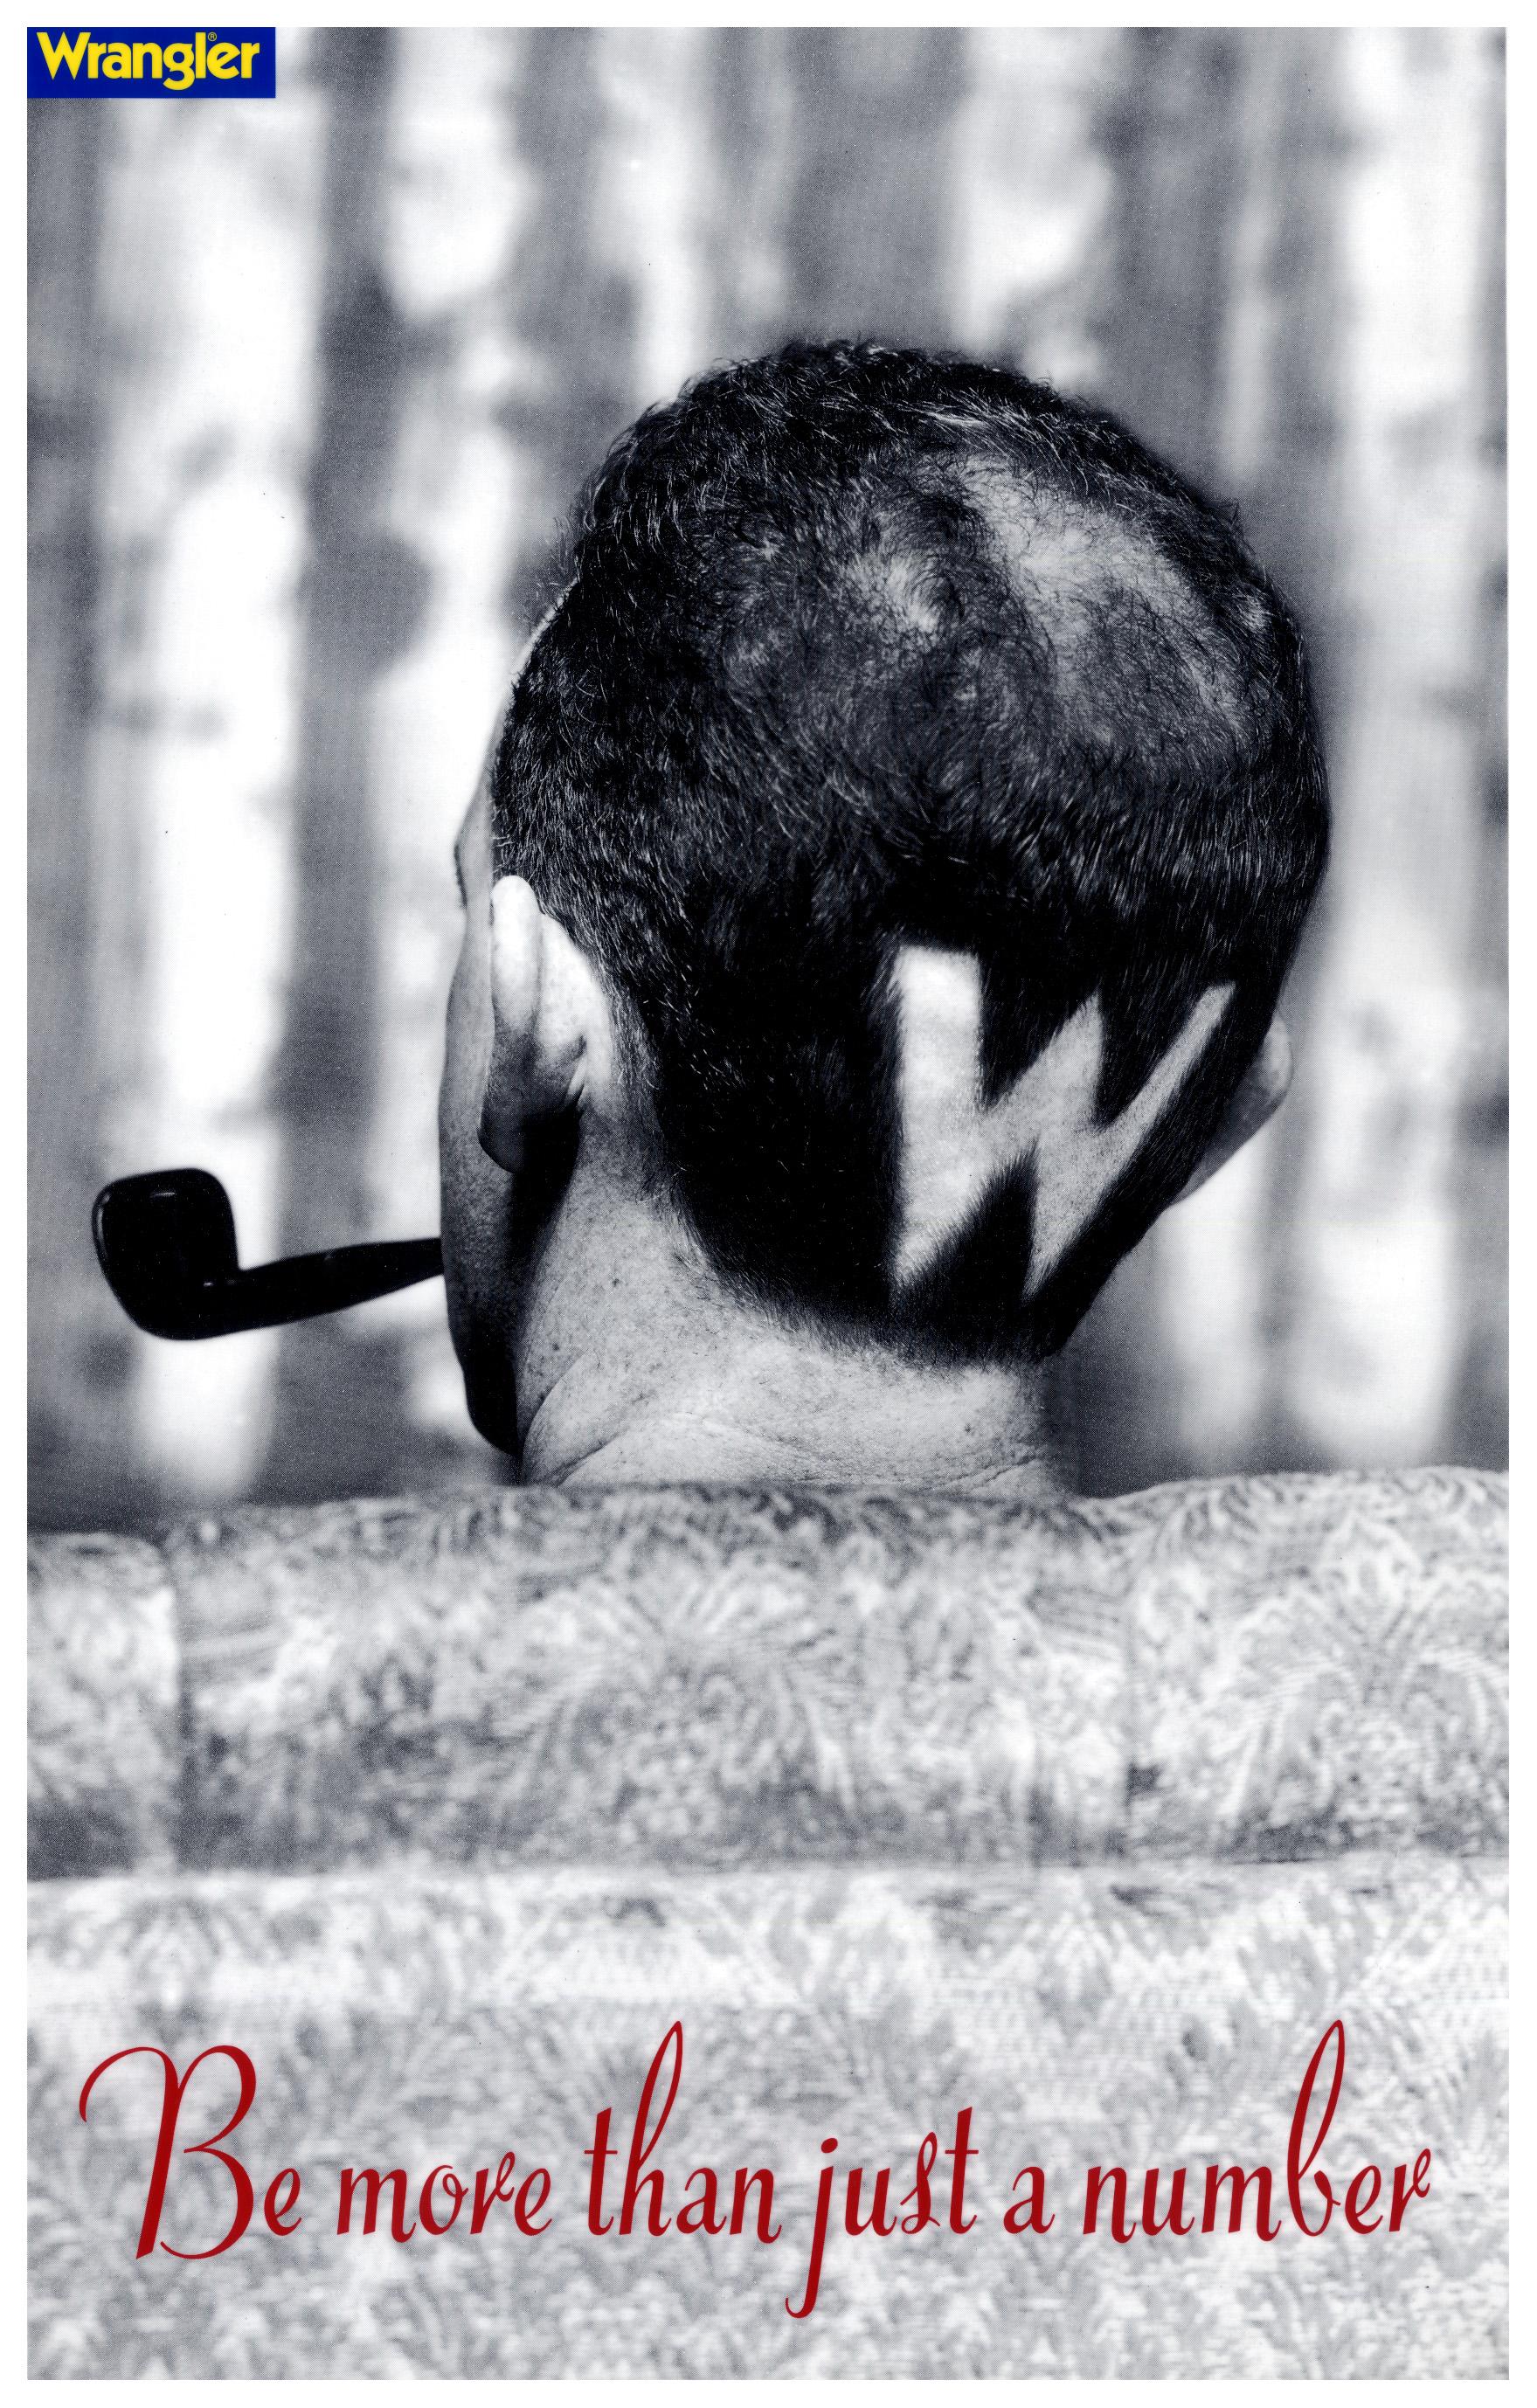 wrangler_posters_pipe